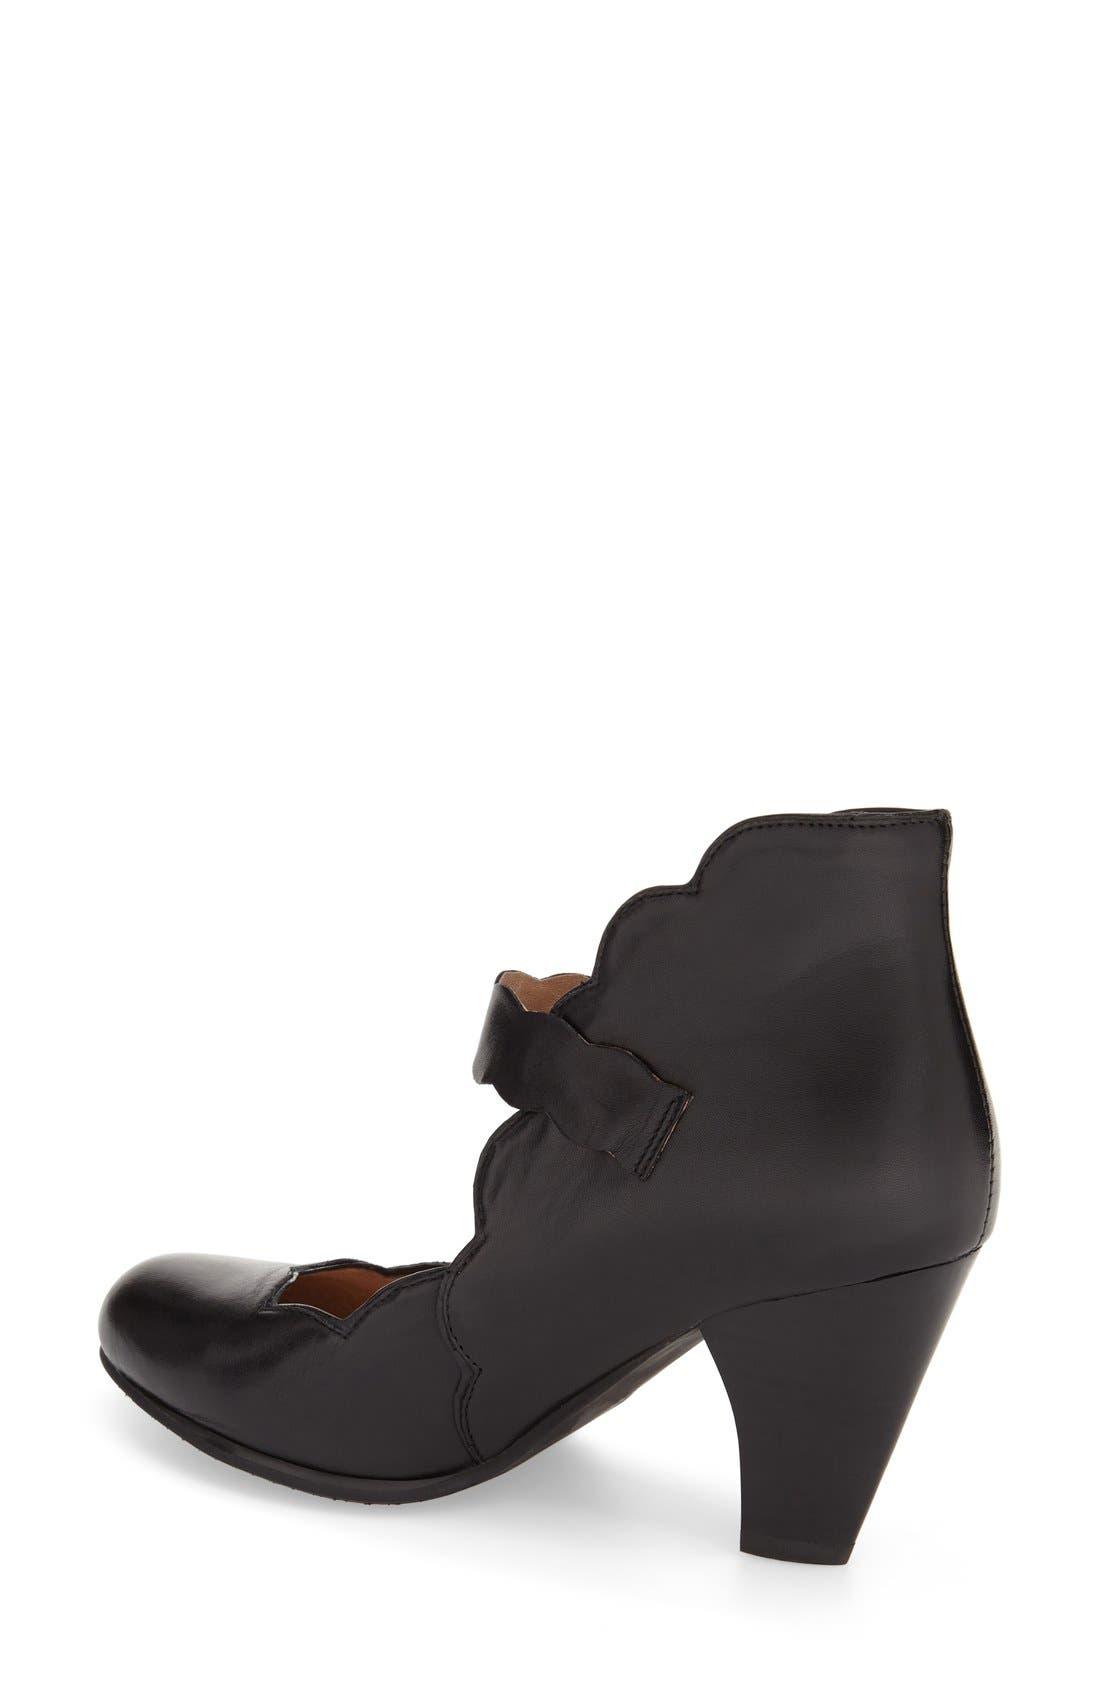 Footwear 'Carissa' Mary Jane Pump,                             Alternate thumbnail 2, color,                             001